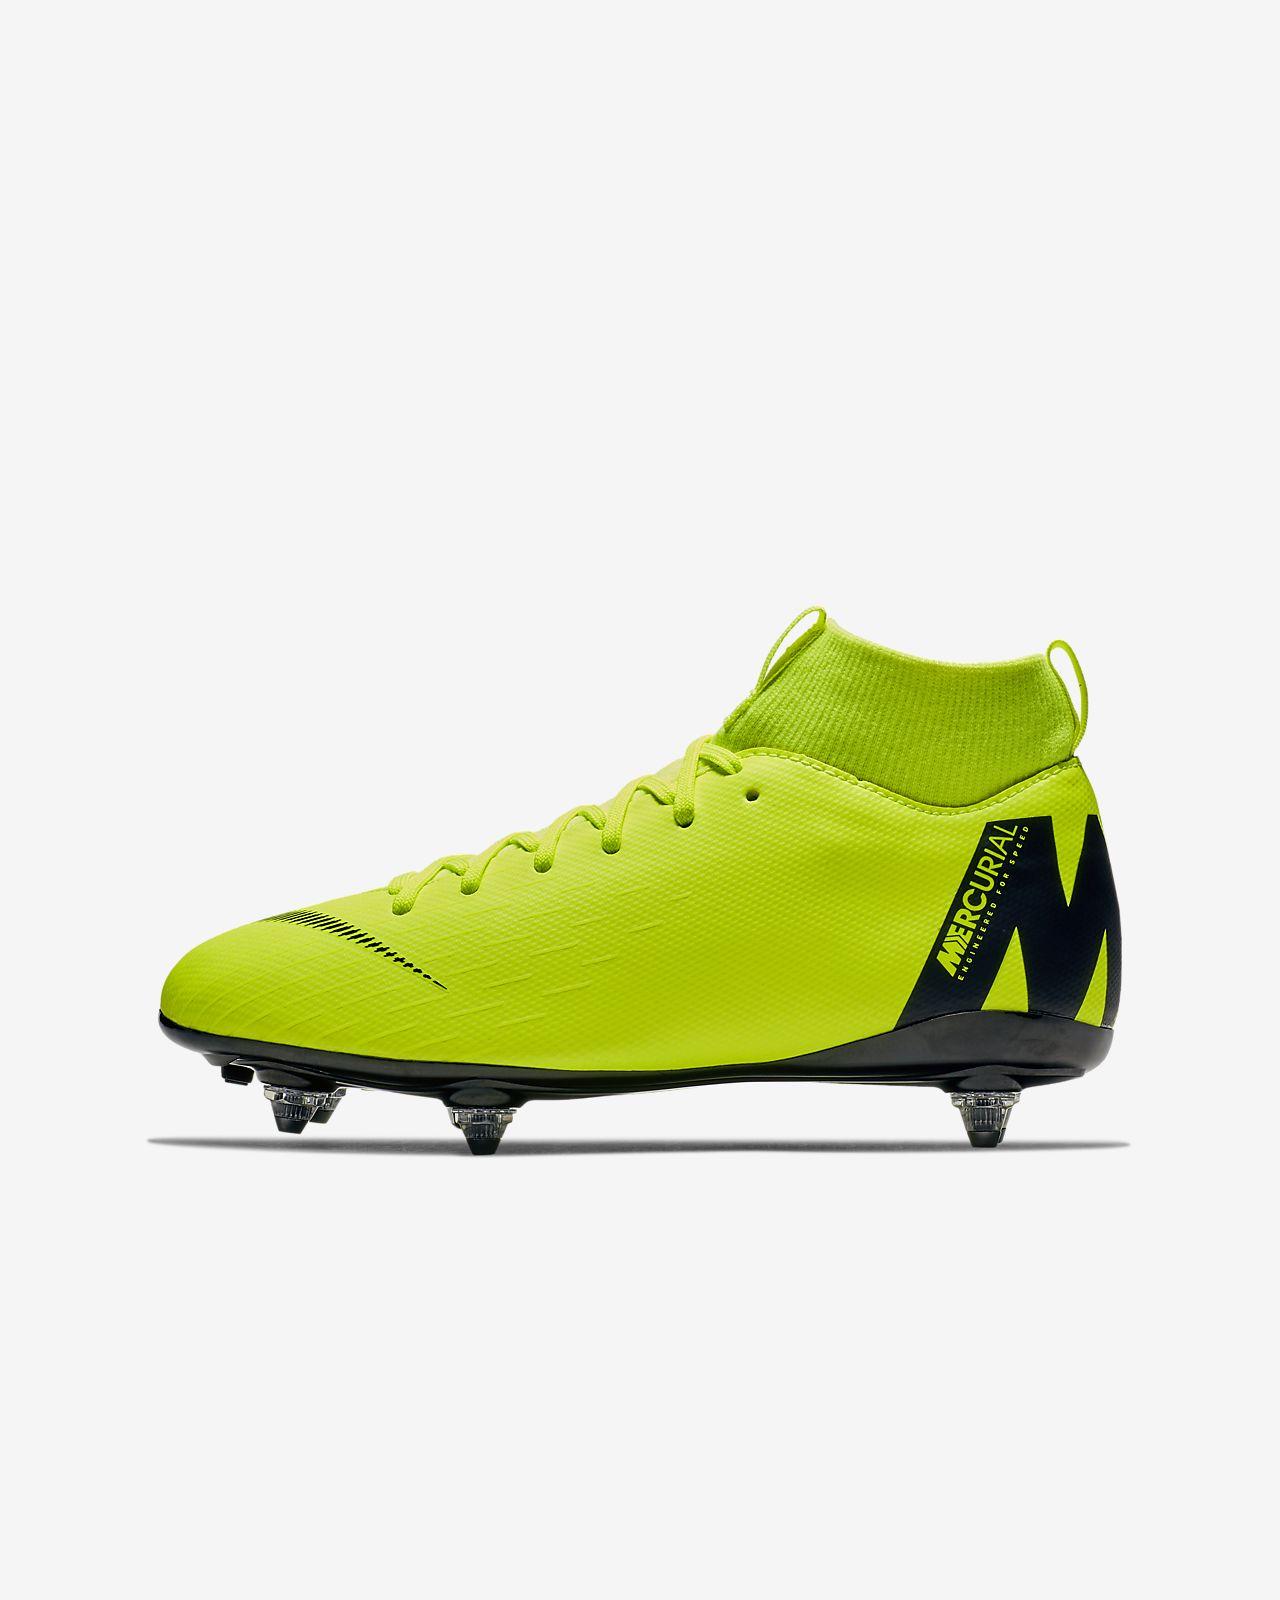 quality design 6ad93 56984 ... Chaussure de football à crampons pour terrain gras Nike Jr. Mercurial  Superfly VI Academy SG